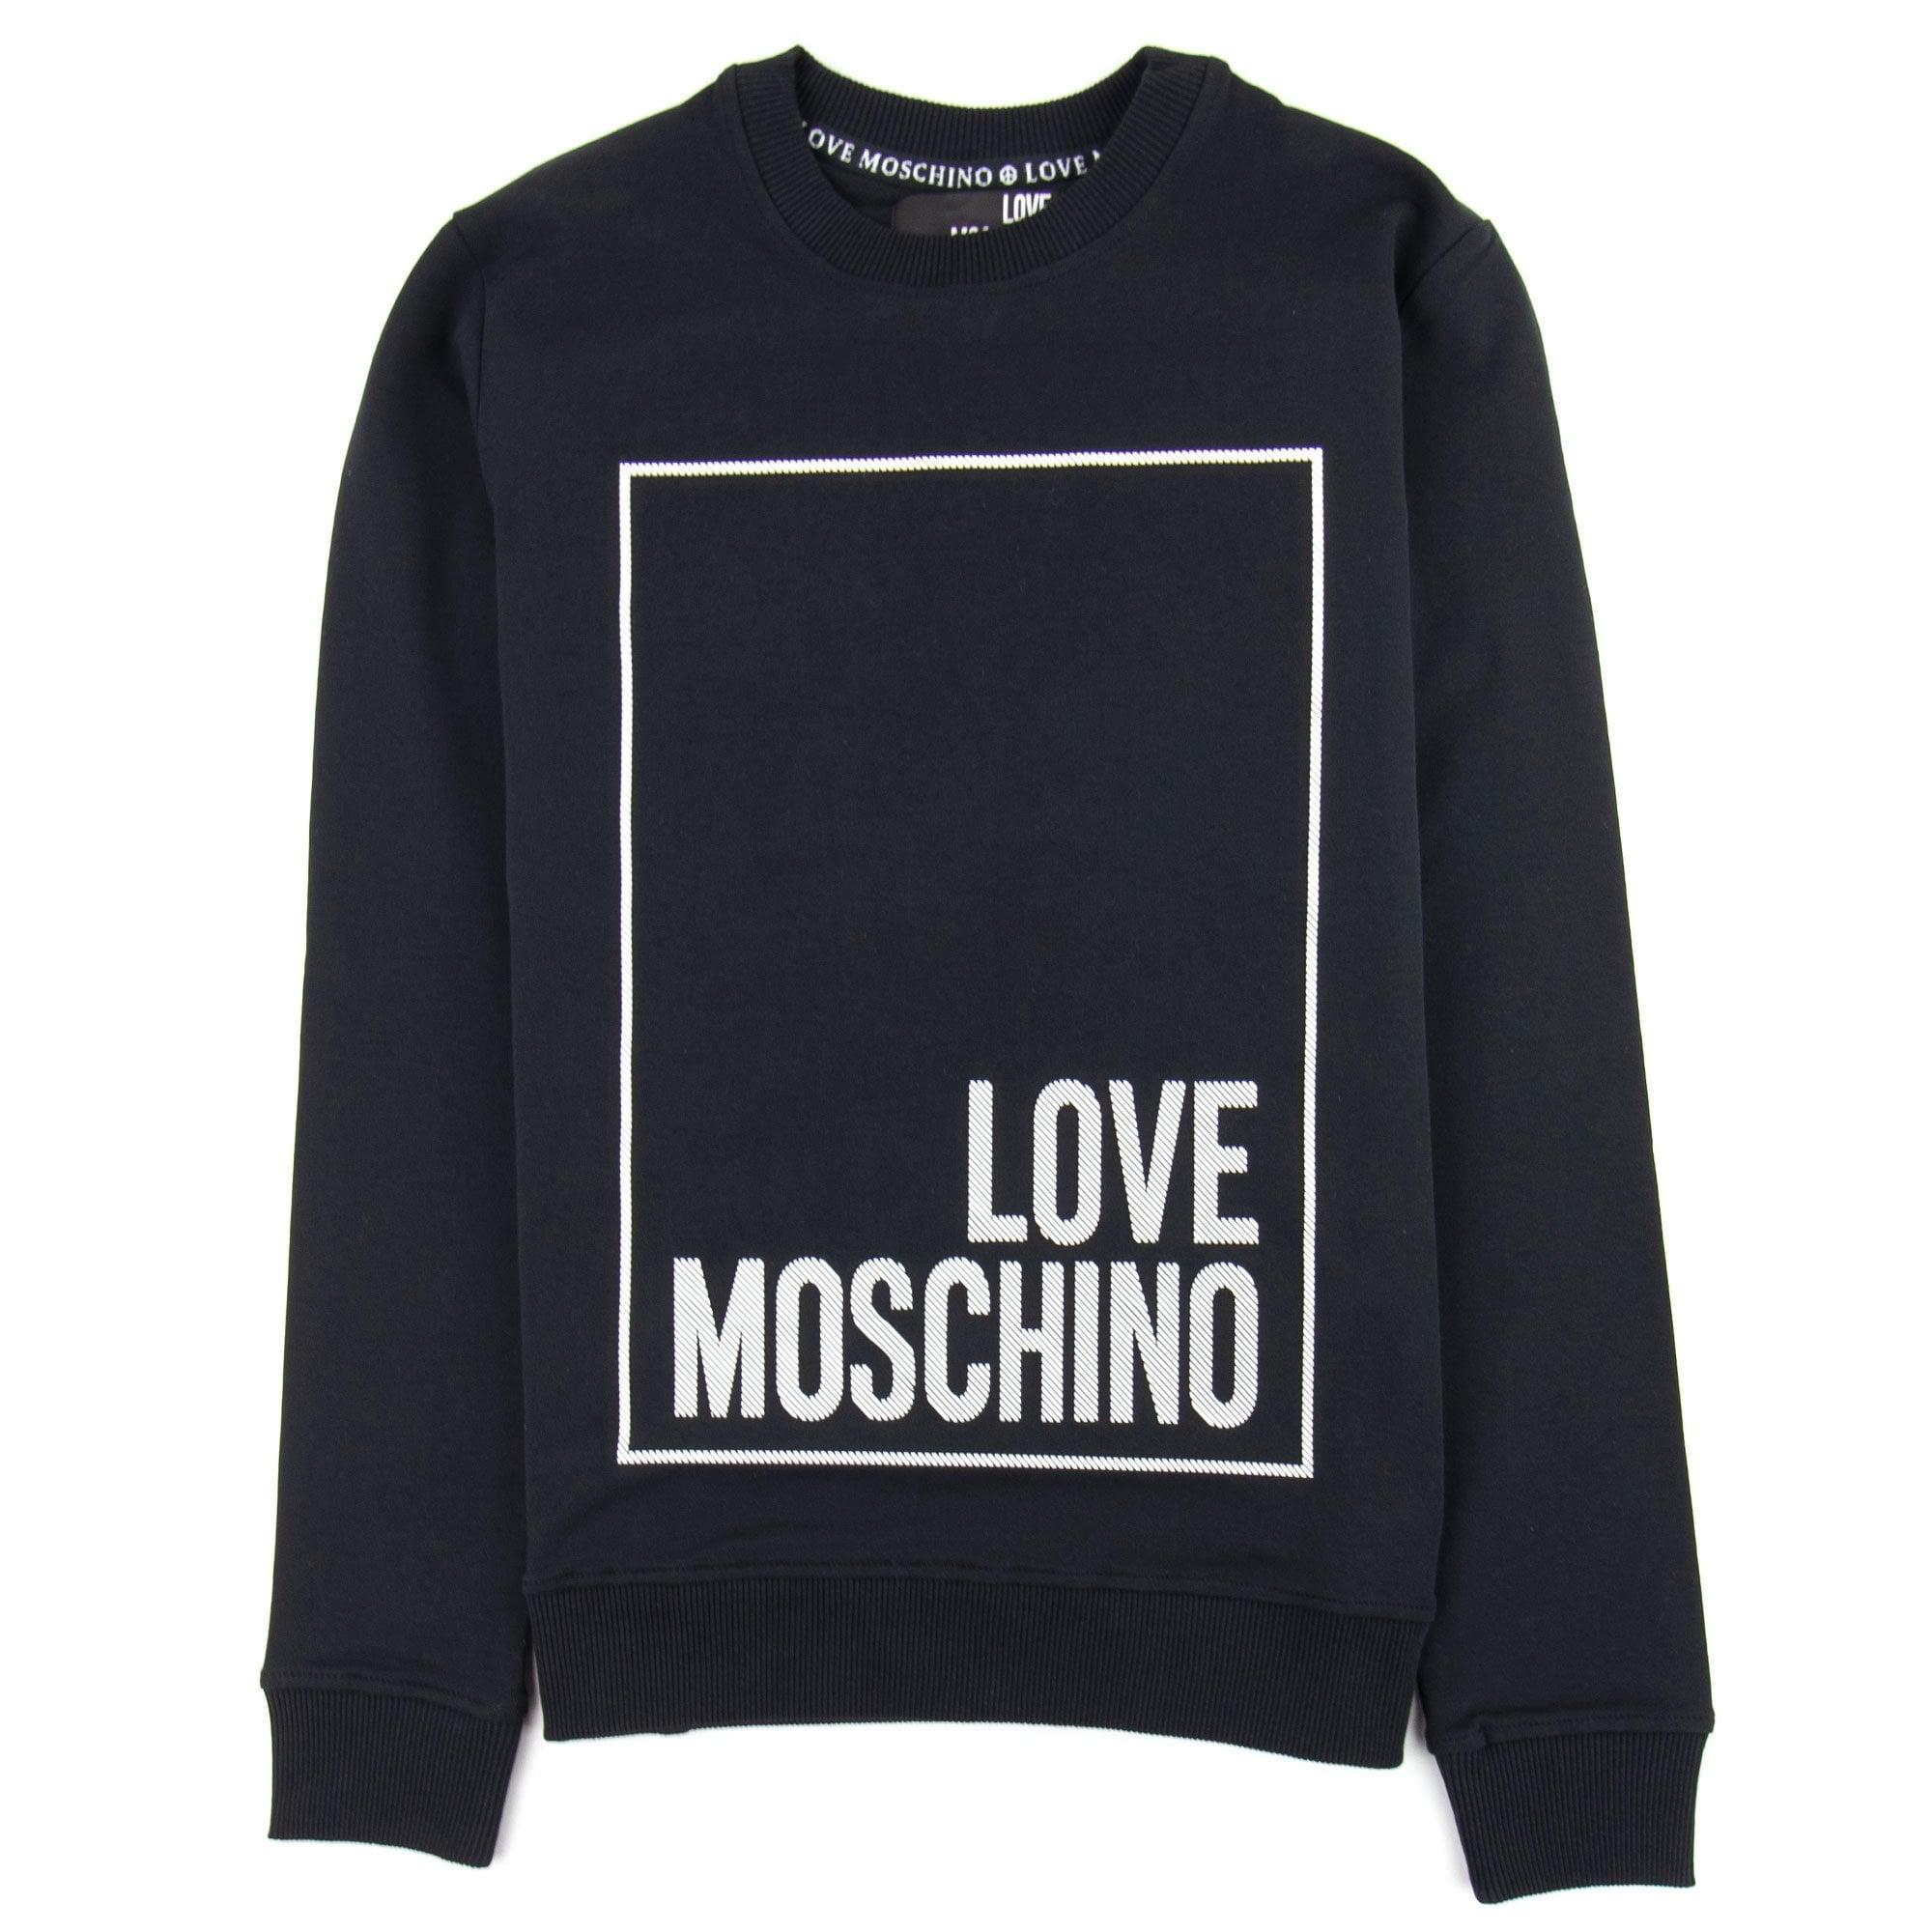 Love Moschino All Over Logo Jumper Black